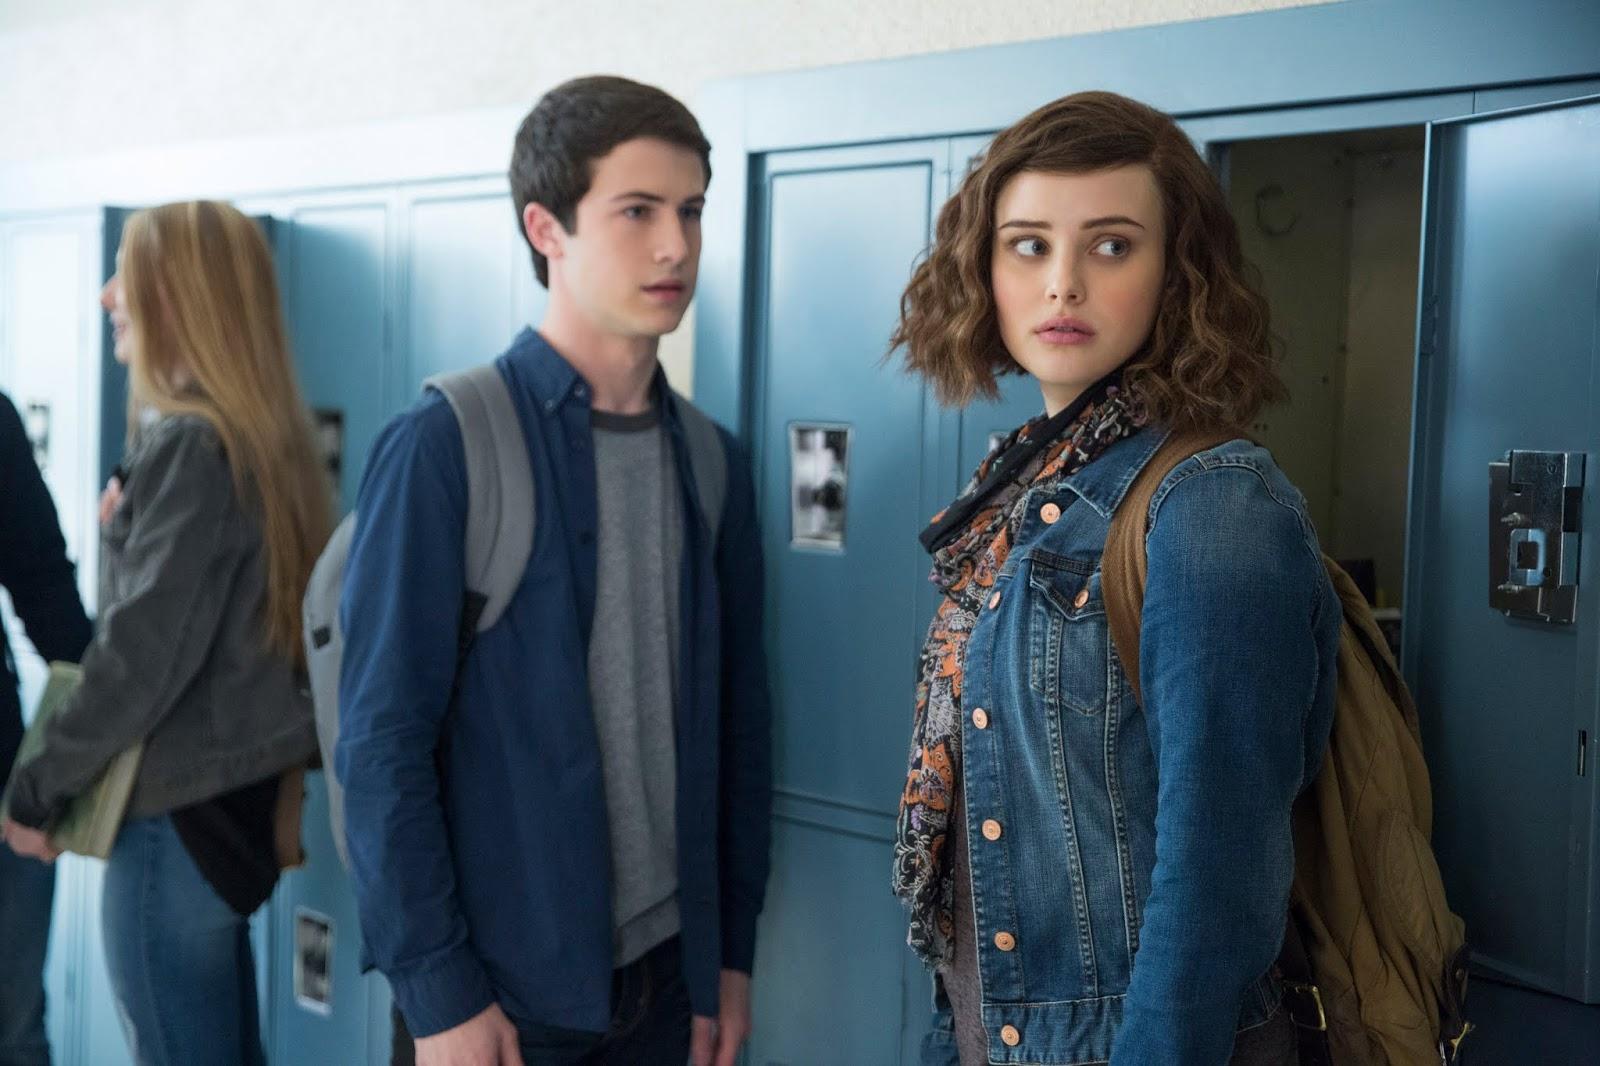 13 Reasons Why, School, Dylan Minnette, Clay Jensen, Katherine Langford, TV Series